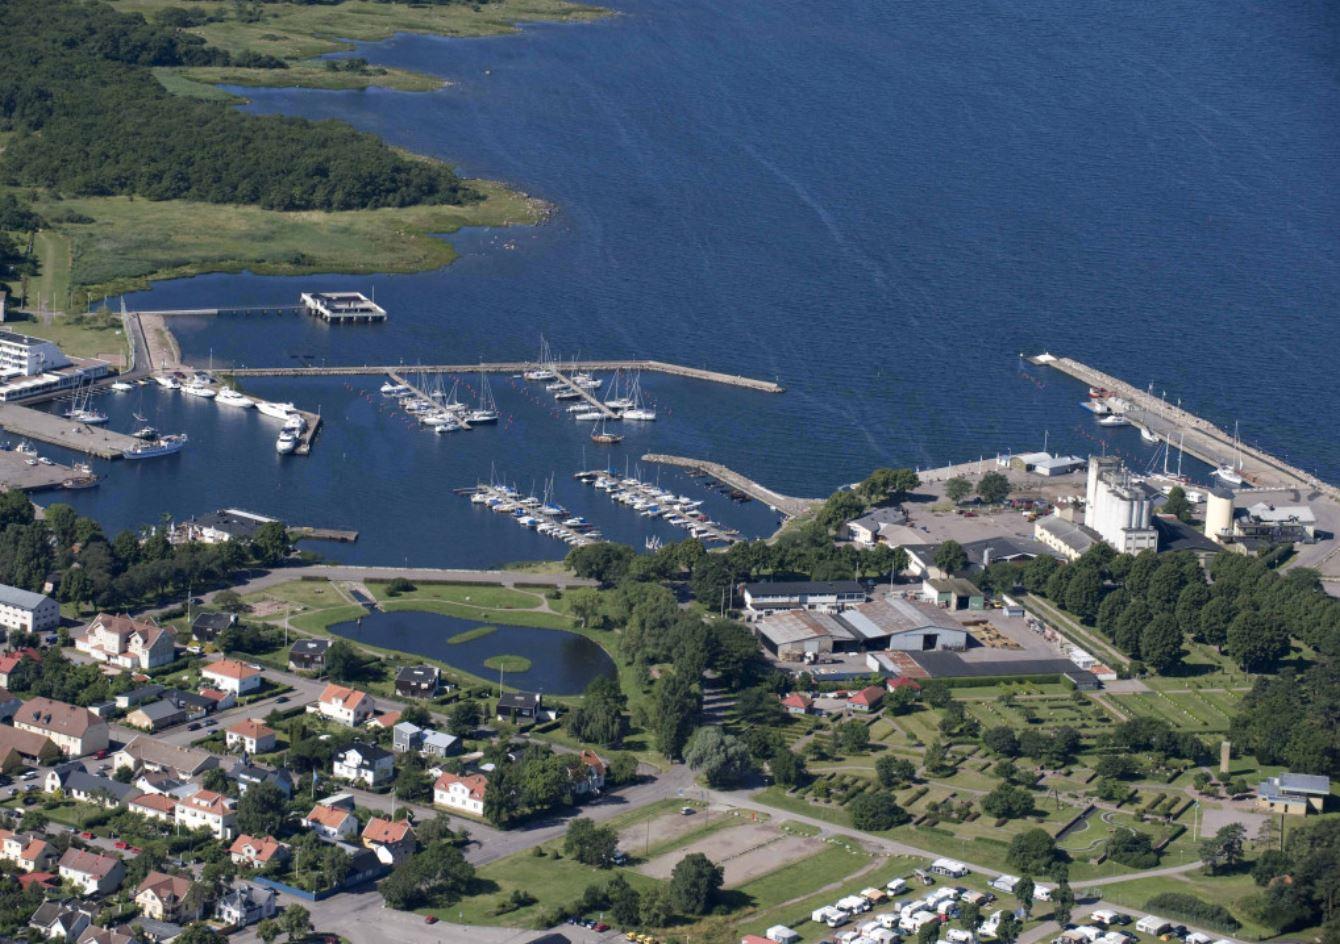 Ställplats - Borgholms Hamn